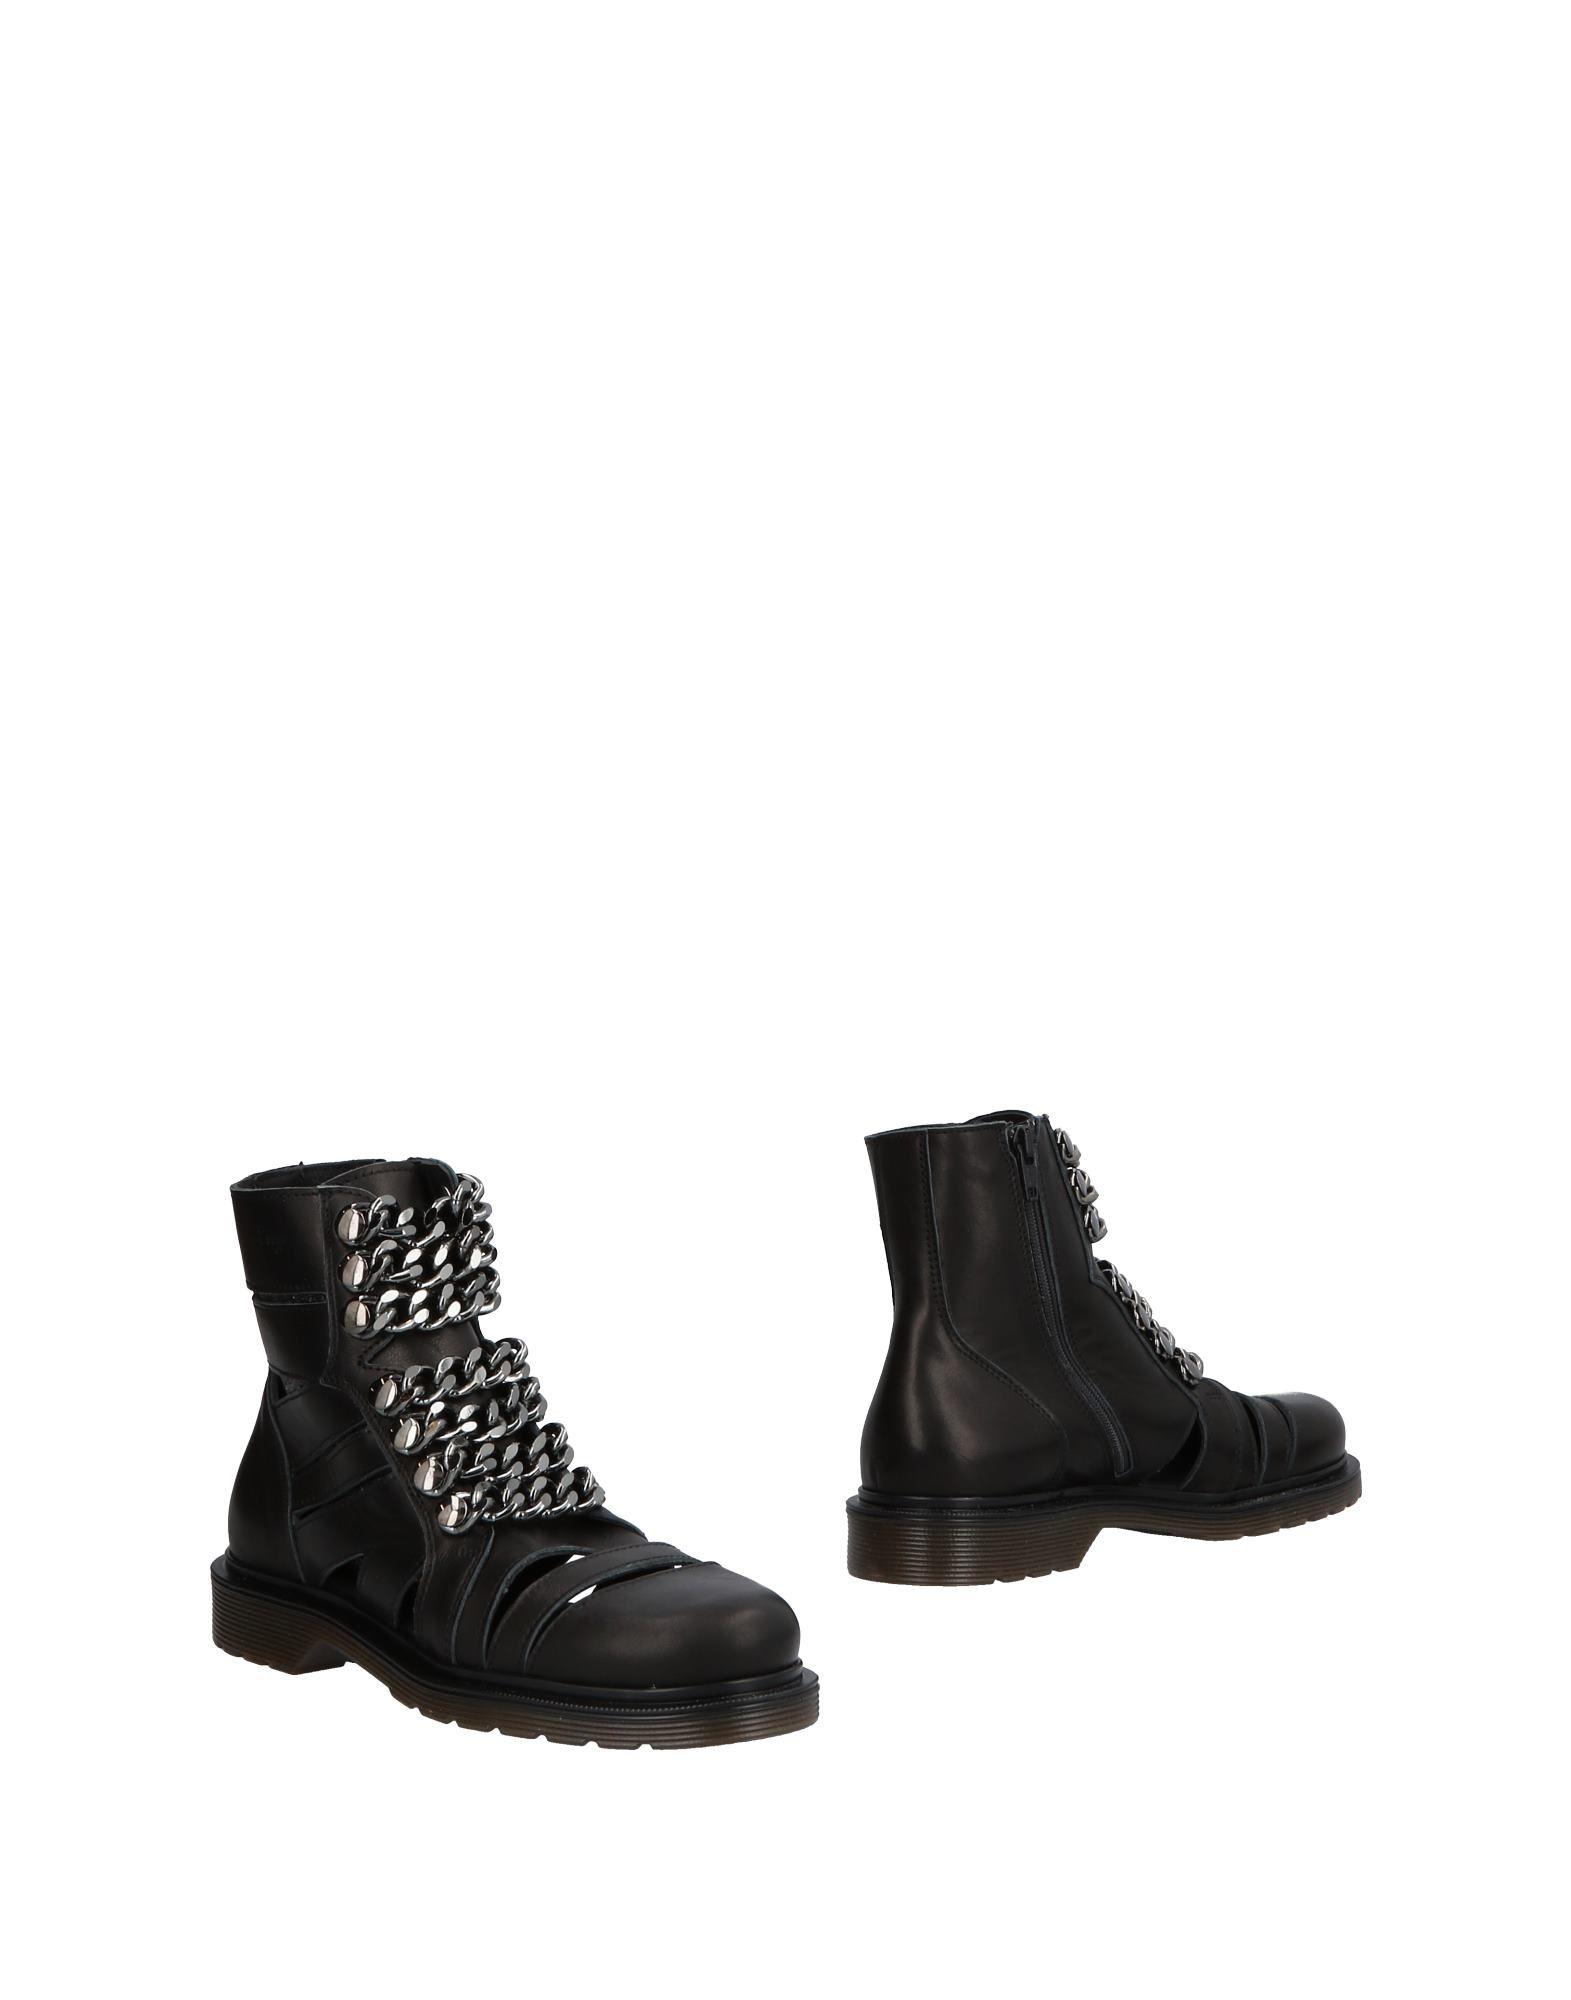 Le Dangerouge Stiefelette Damen  11506222XTGut aussehende strapazierfähige Schuhe